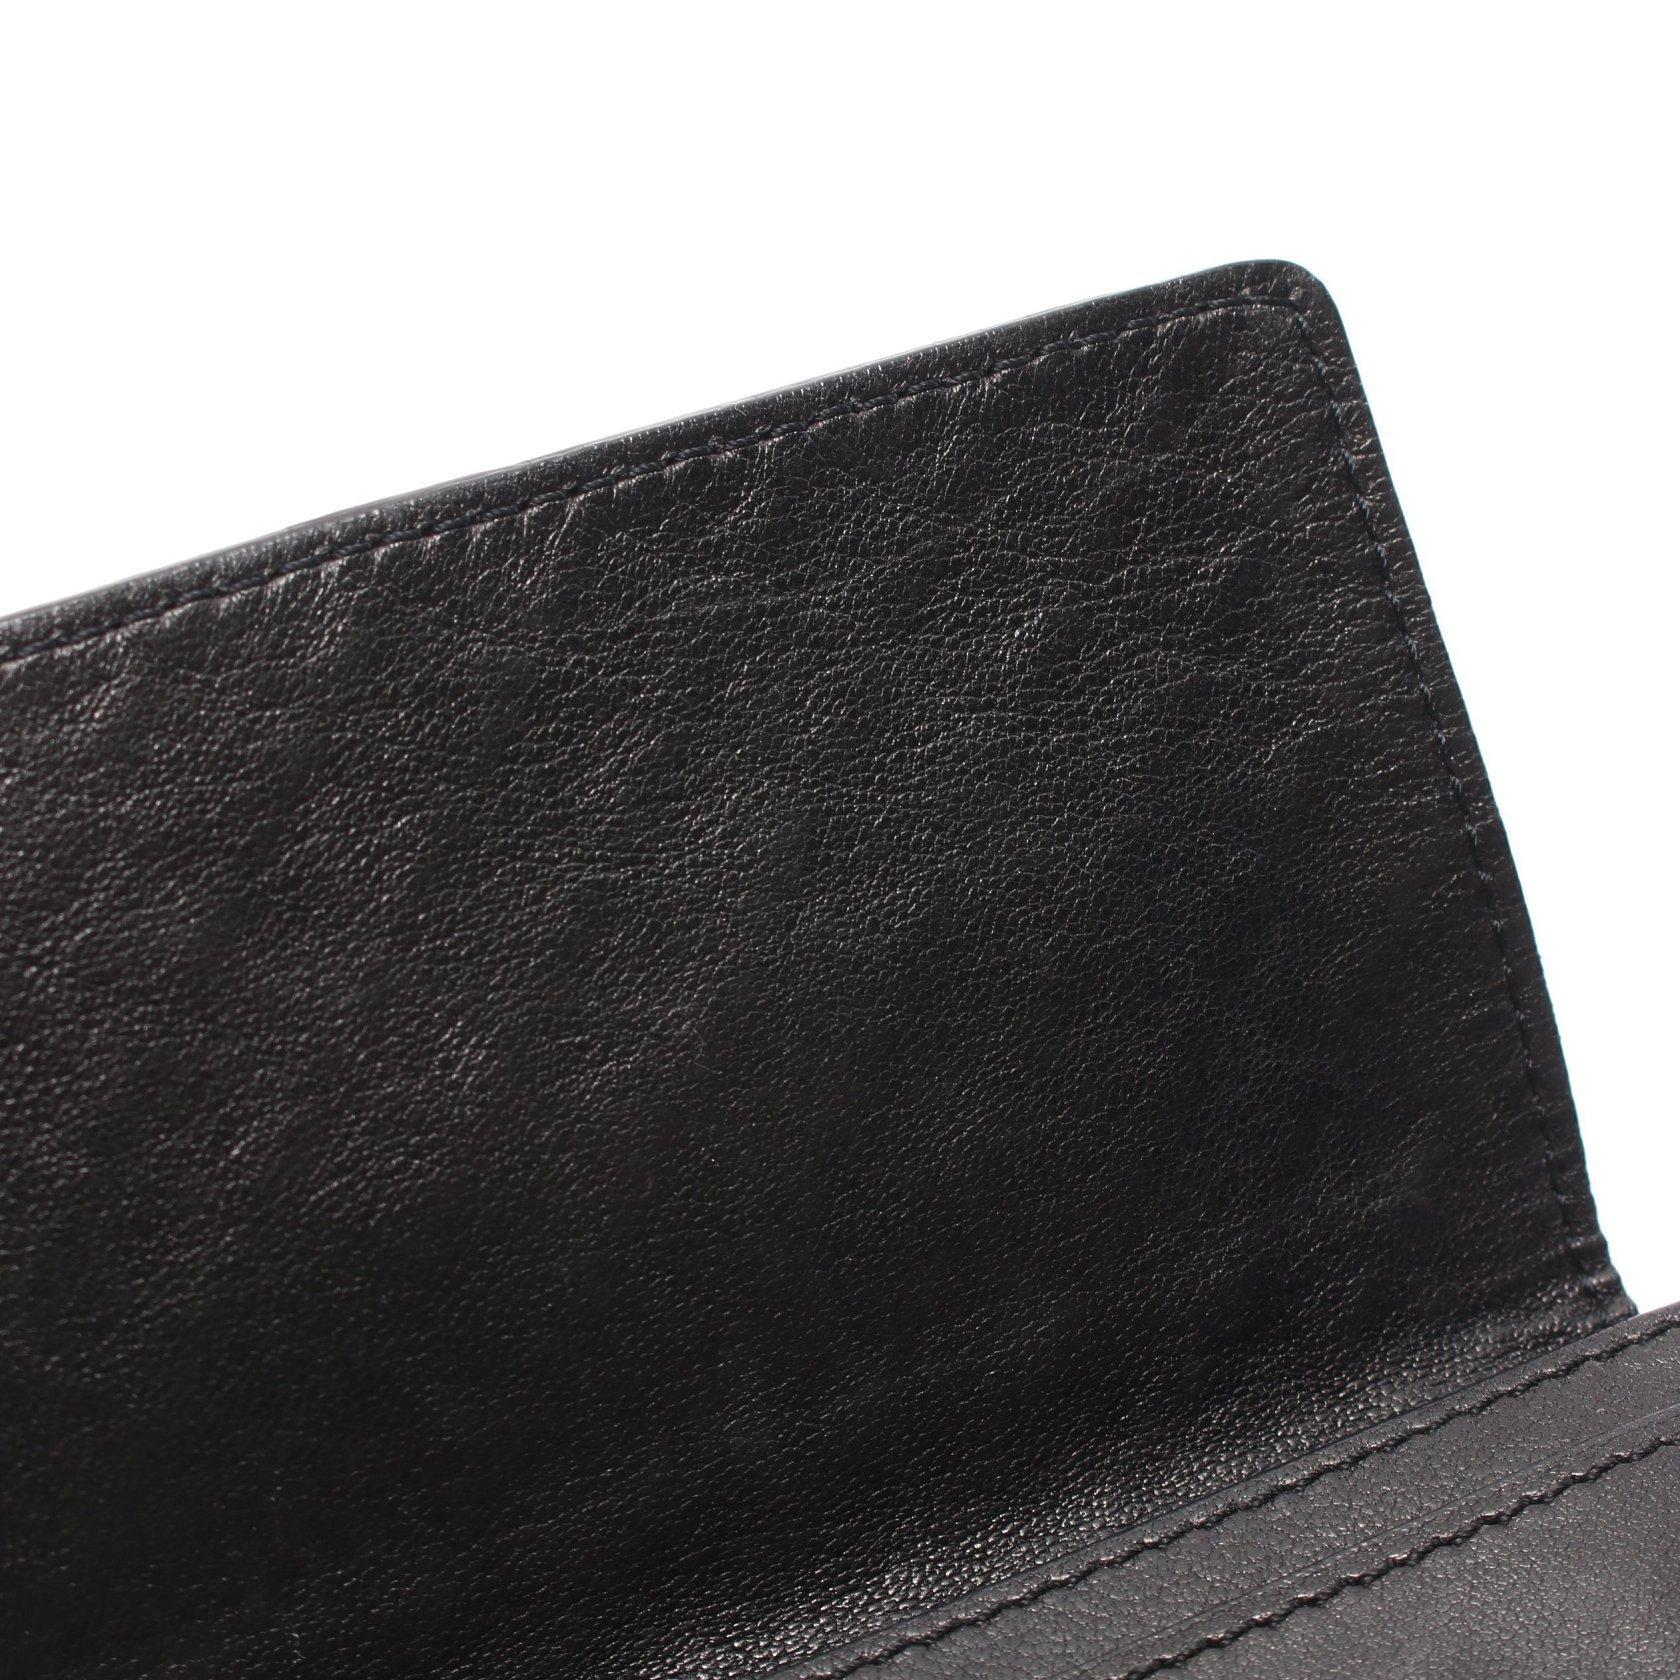 BOTTEGA VENETA・財布・小物・イントレチャート カードケース 名刺入れ レザー ブラック